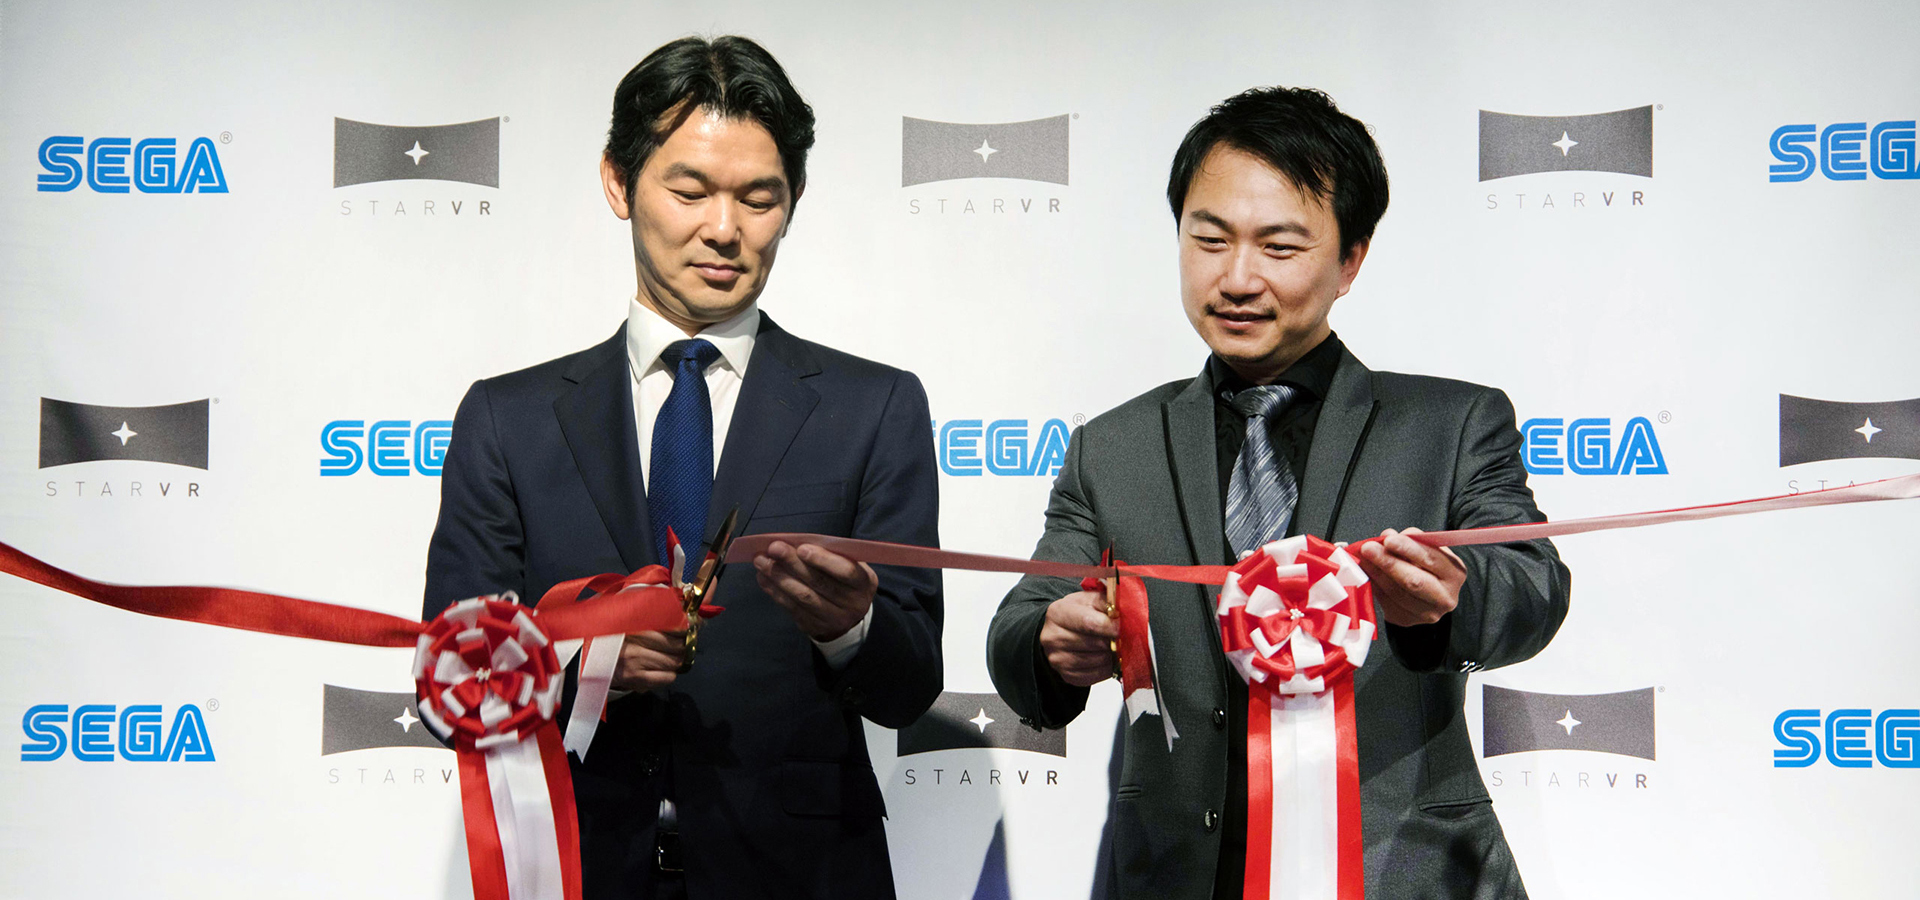 SEGA Entertainment and StarVR Introduce Premium VR Arcade Experiences to Japan